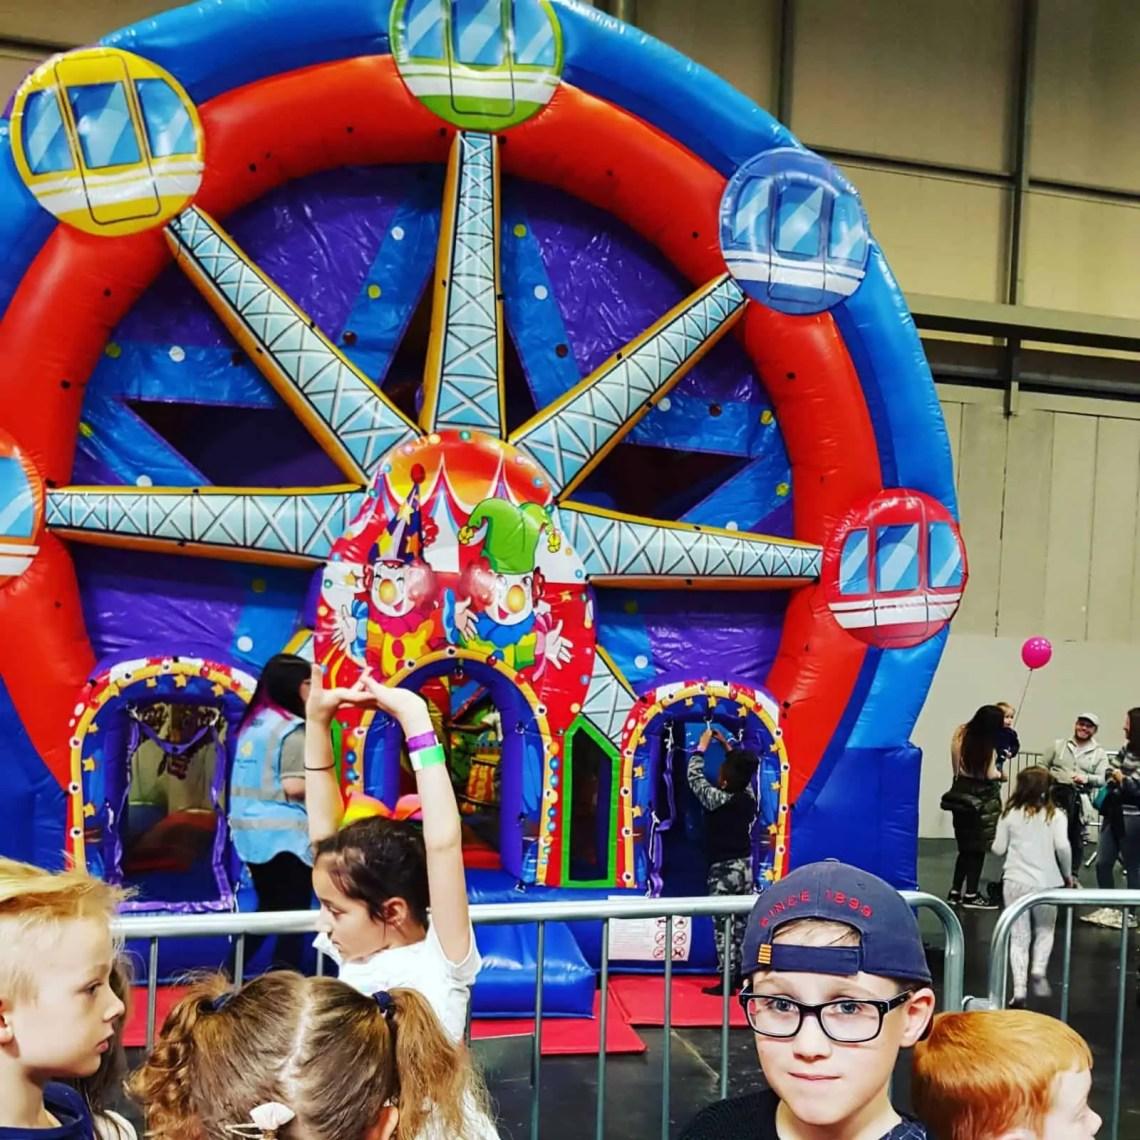 Ferris Wheel Kidstropolis NEC 2018